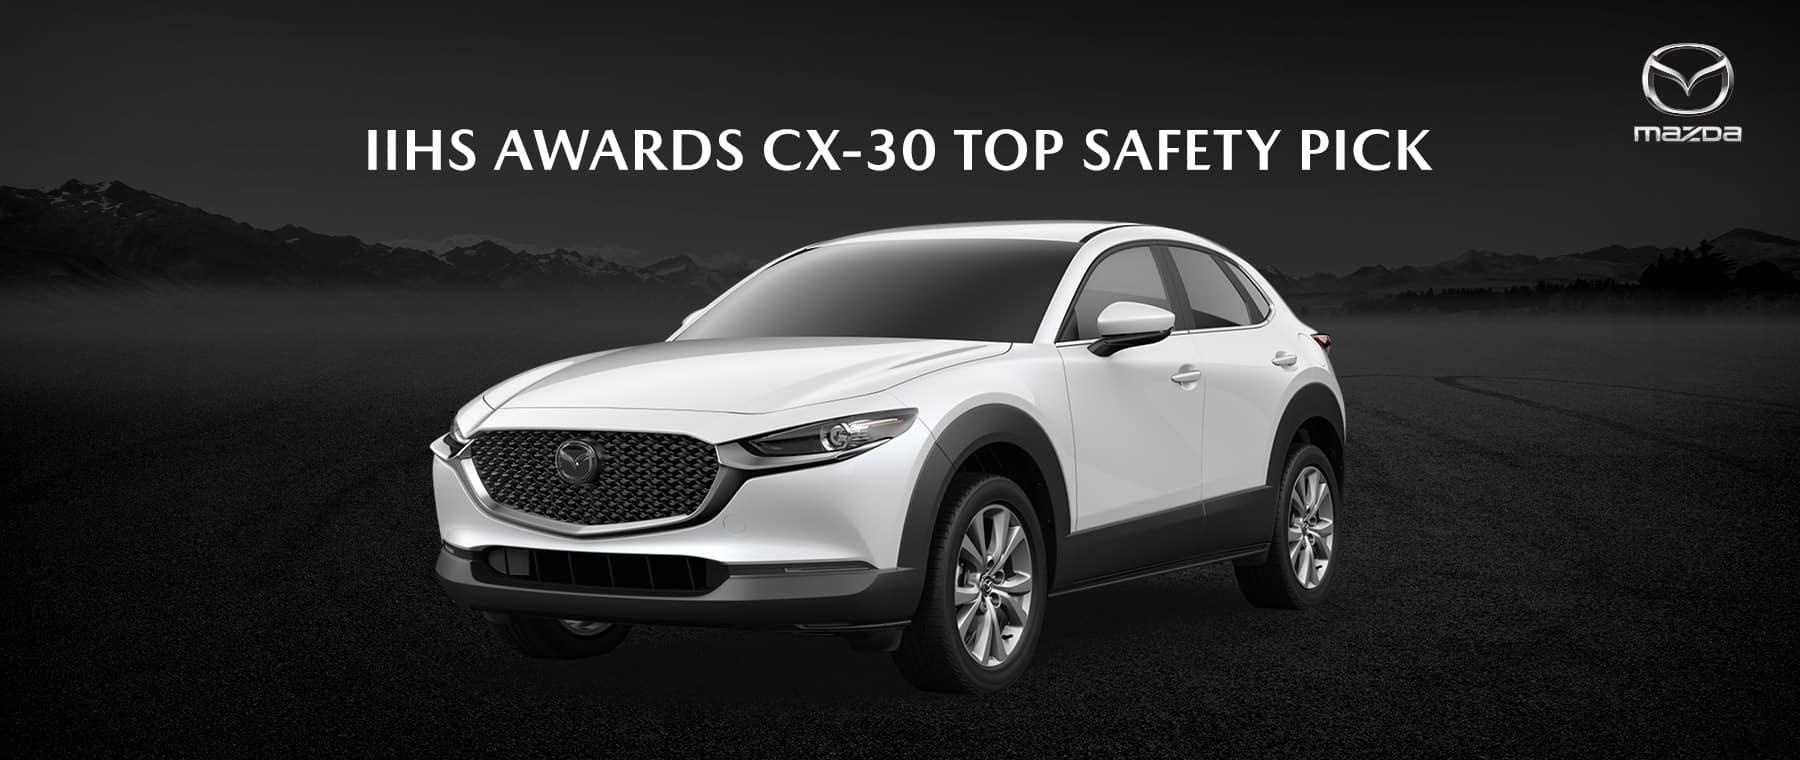 2020 Mazda CX-30 Wins Top Safety Pick Award - Bert Ogden Mission Mazda - Mission, TX